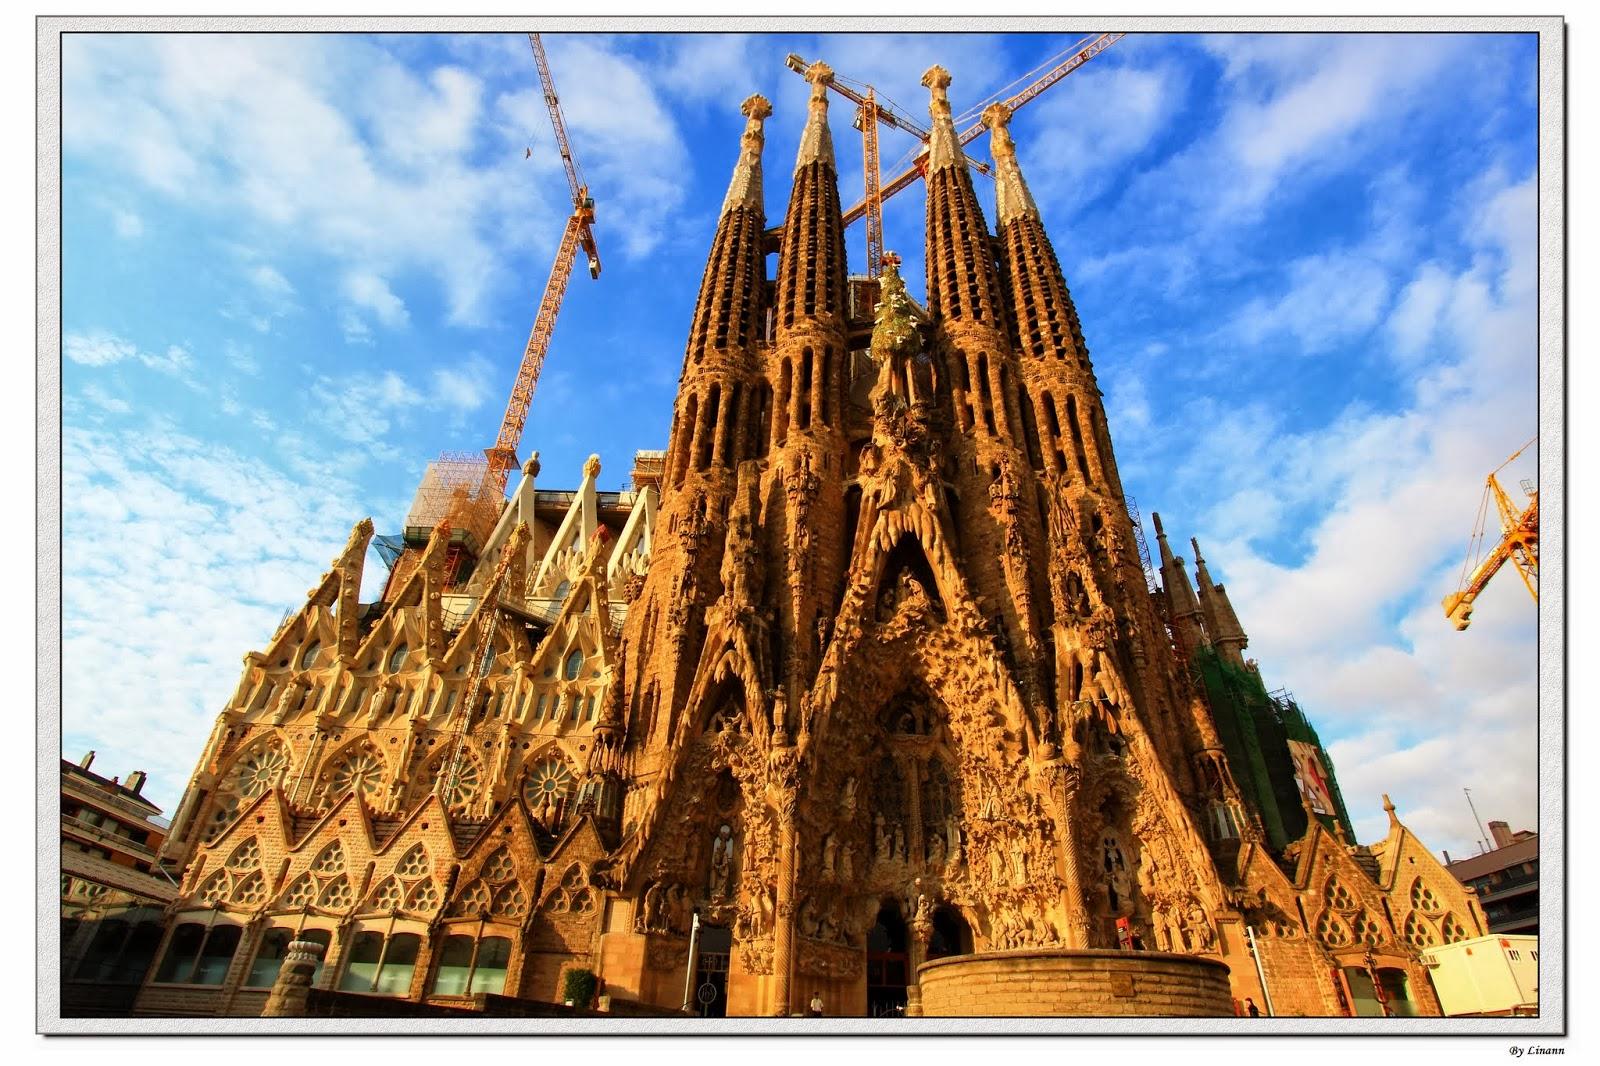 pssbc10's territory: (西班牙)巴塞隆納:聖家堂 Sagrada Familia